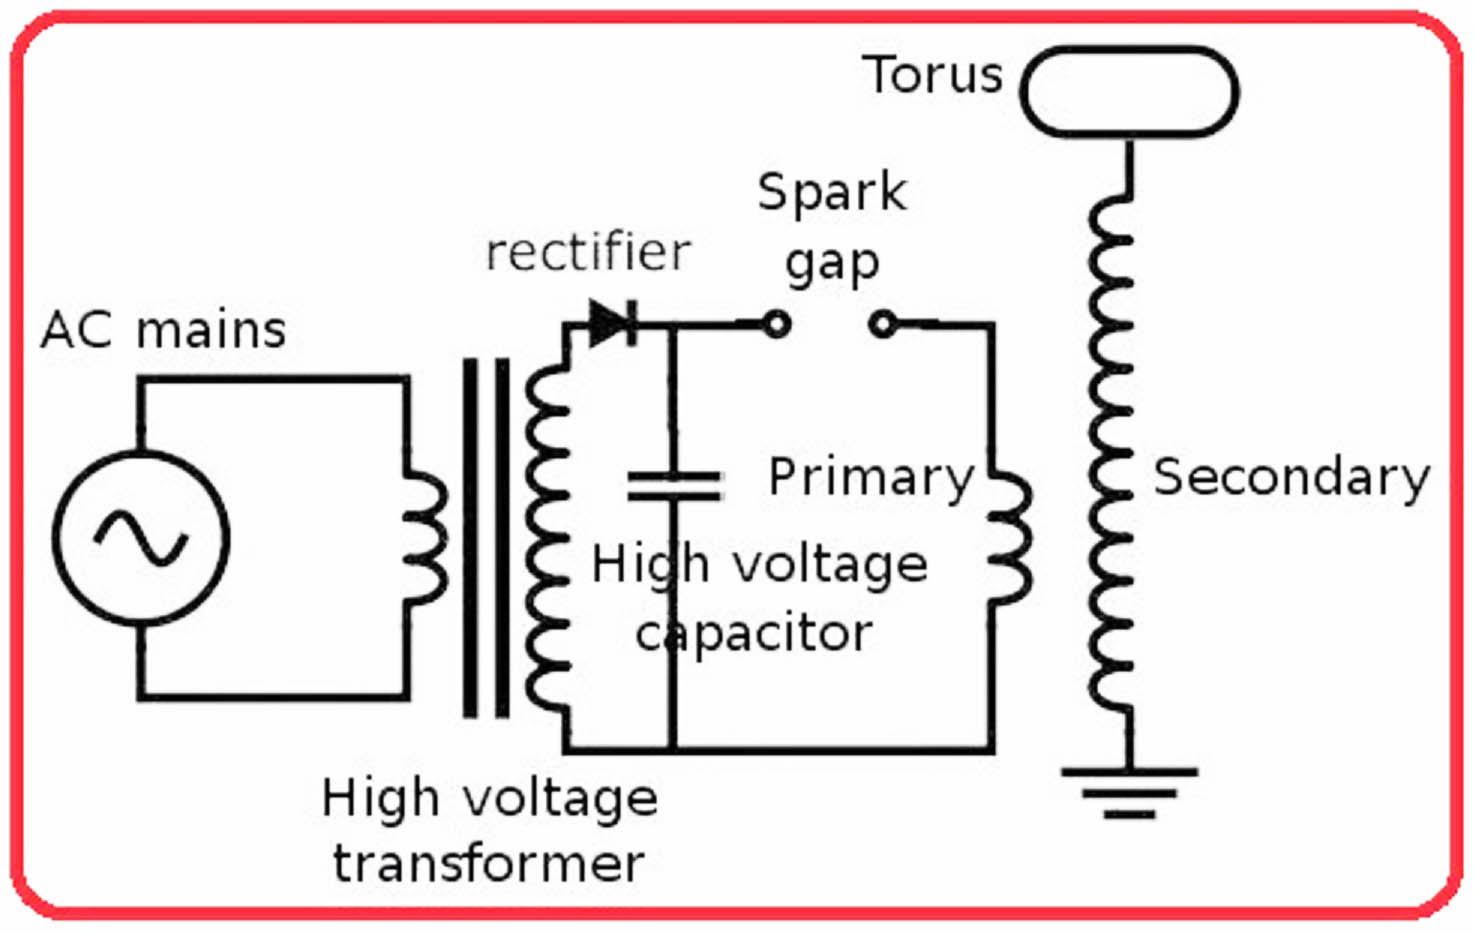 6 volt coil wiring diagram for tesla wiring library 6 volt coil wiring diagram [ 1476 x 933 Pixel ]